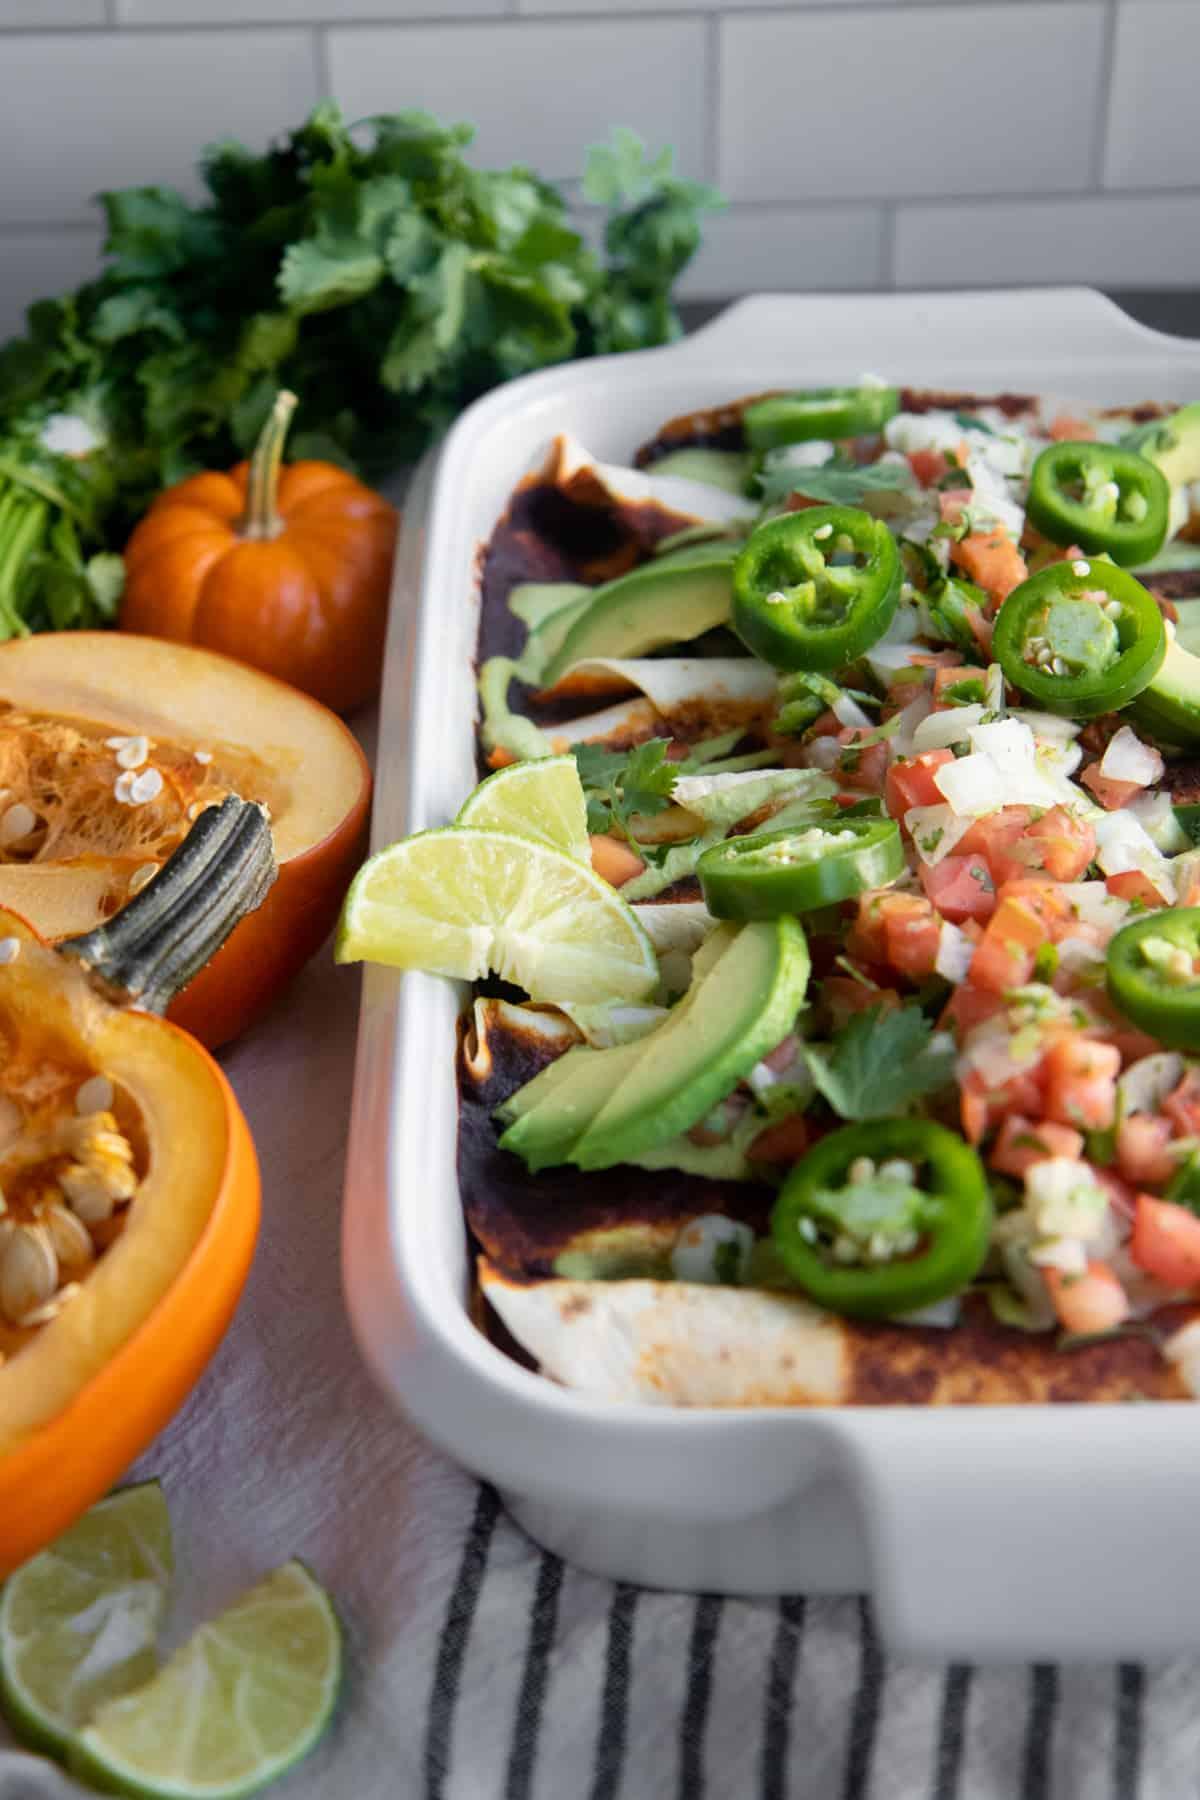 Pan of baked enchiladas next to a halved pumpkin.